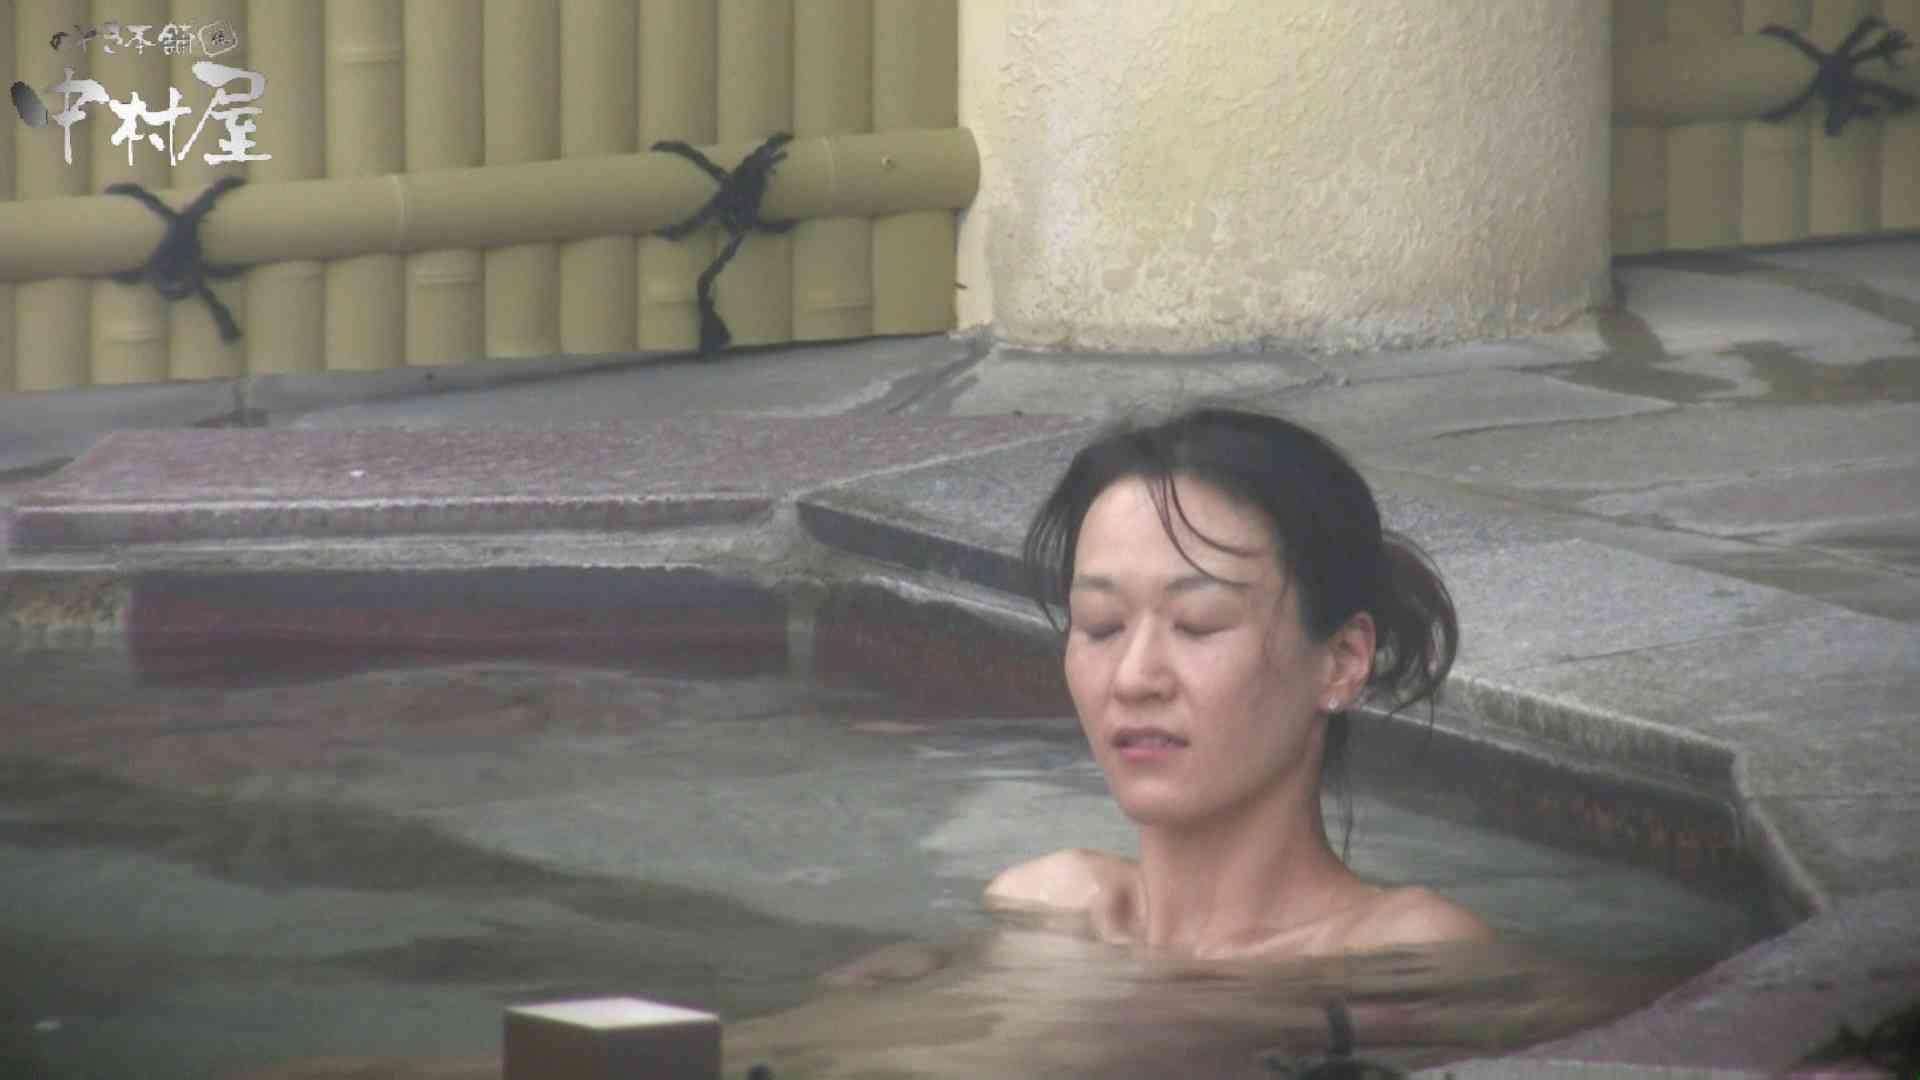 Aquaな露天風呂Vol.928 露天風呂突入 | 盗撮師作品  72pic 4